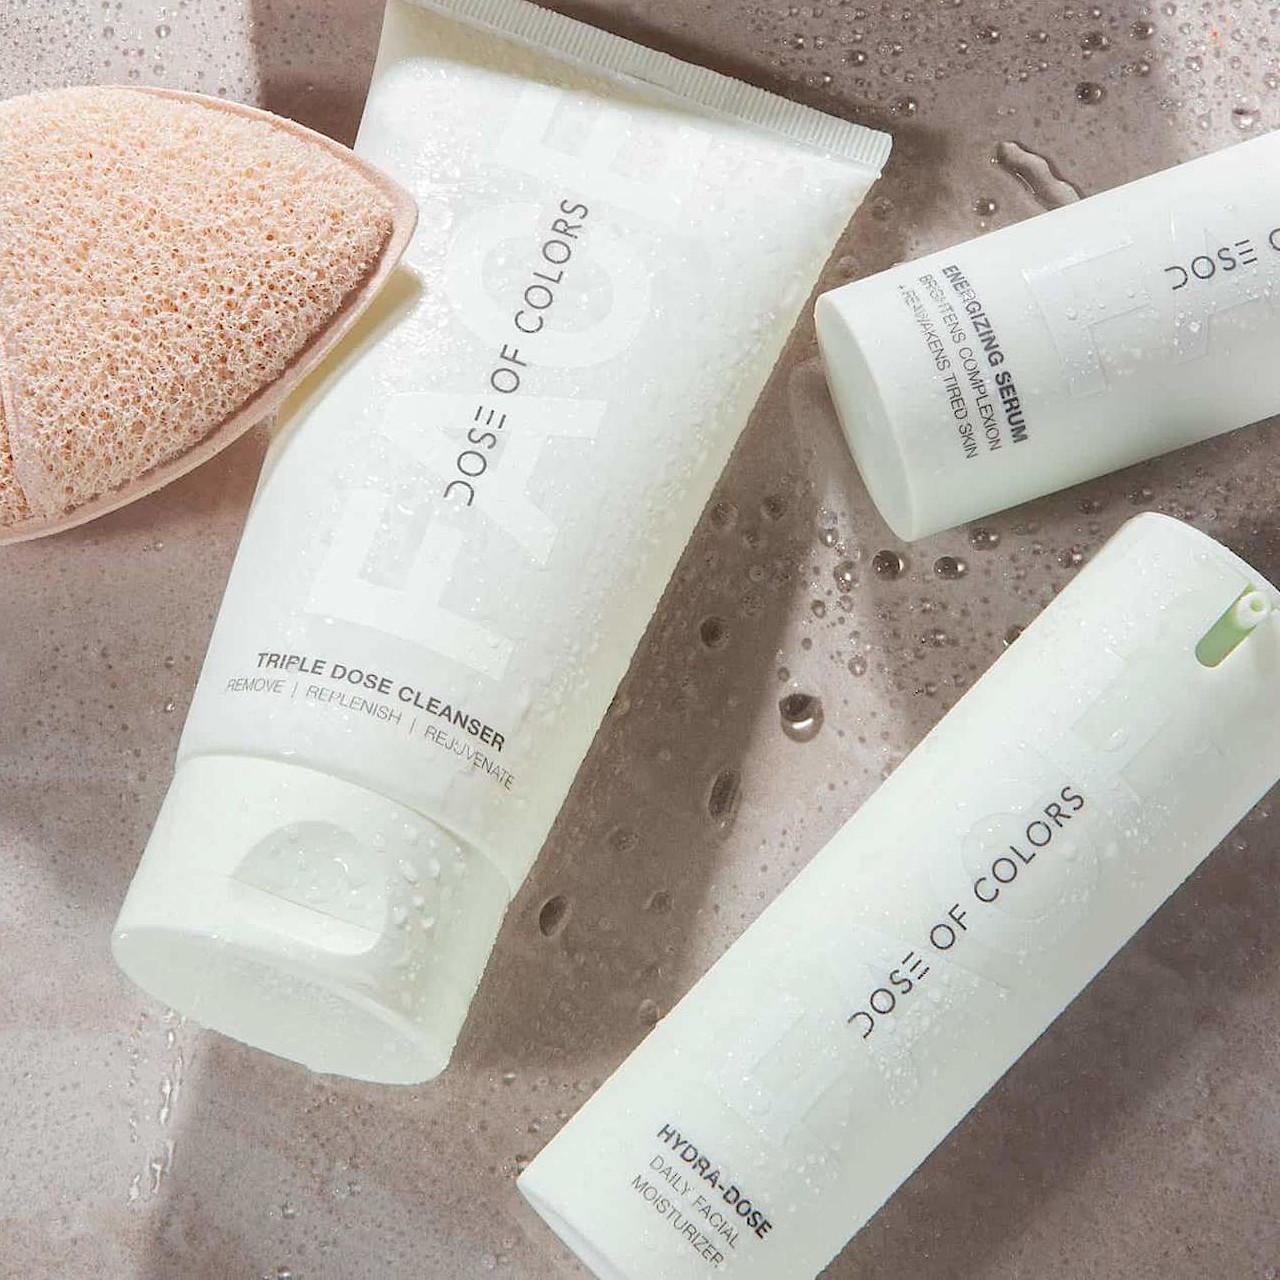 Dose Of Colors Skin Care Complete Skin Care Set Alt